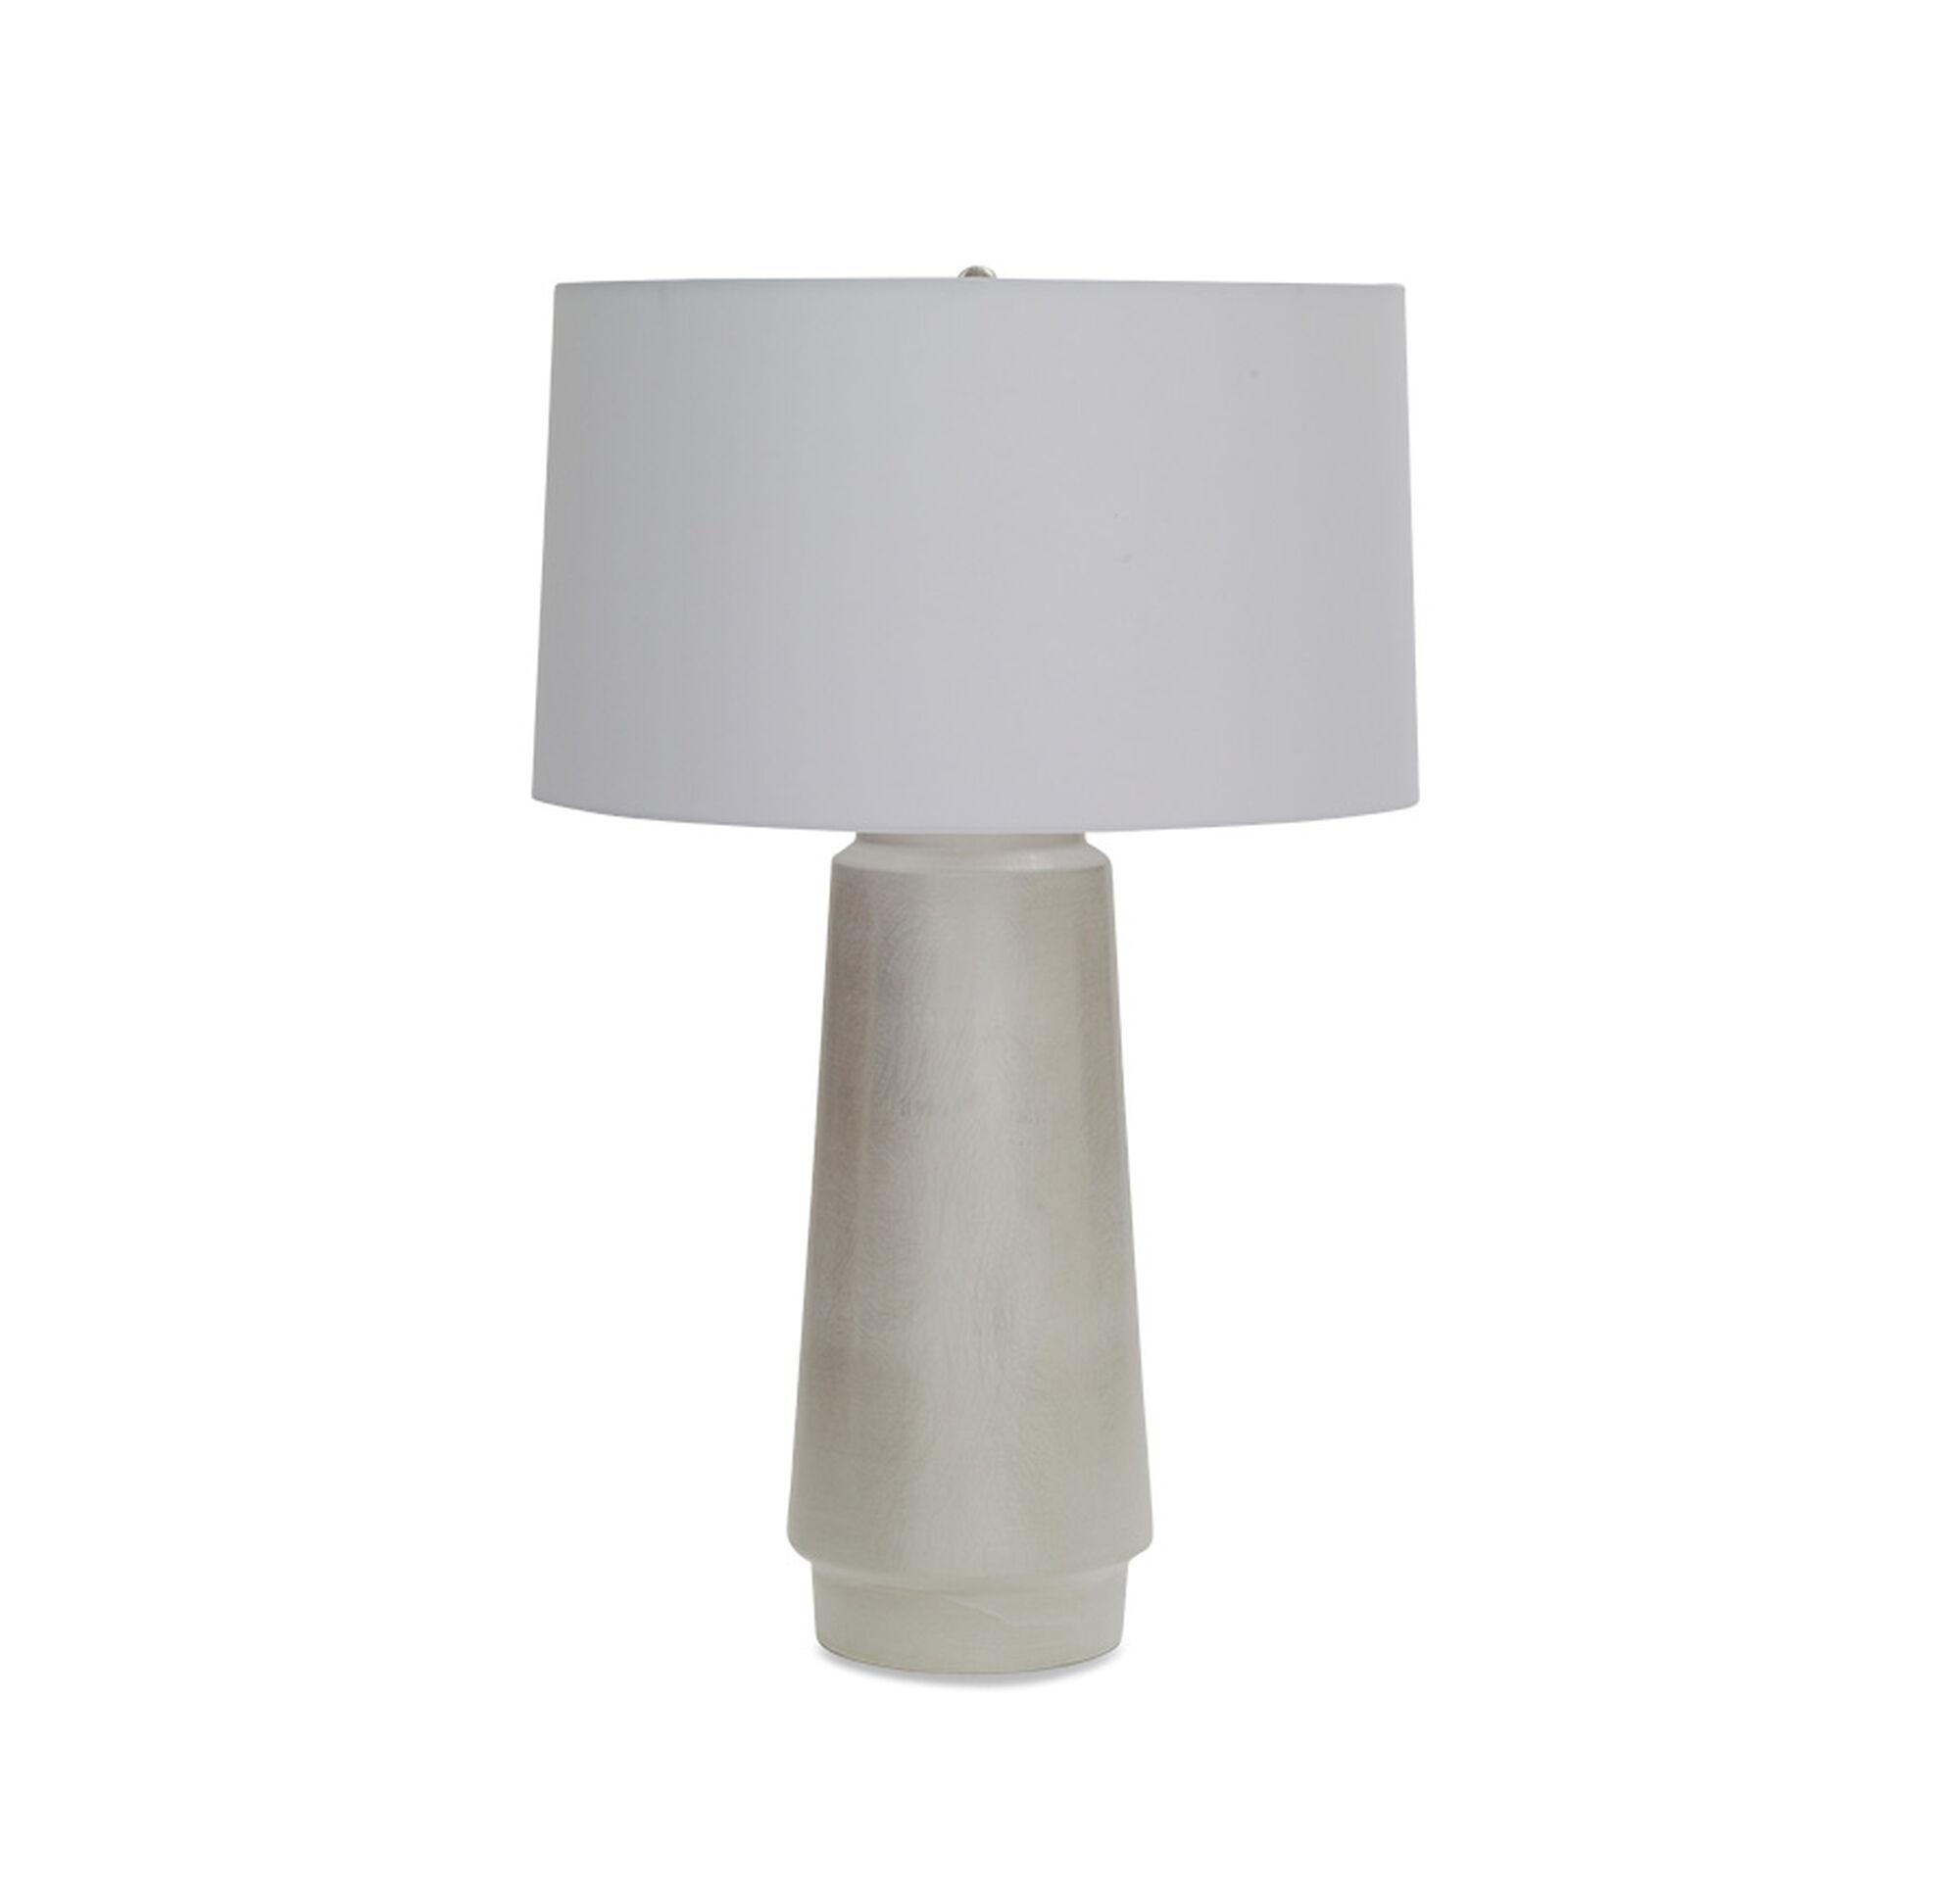 Lime green table lamp - Allaro Table Lamp Hi Res